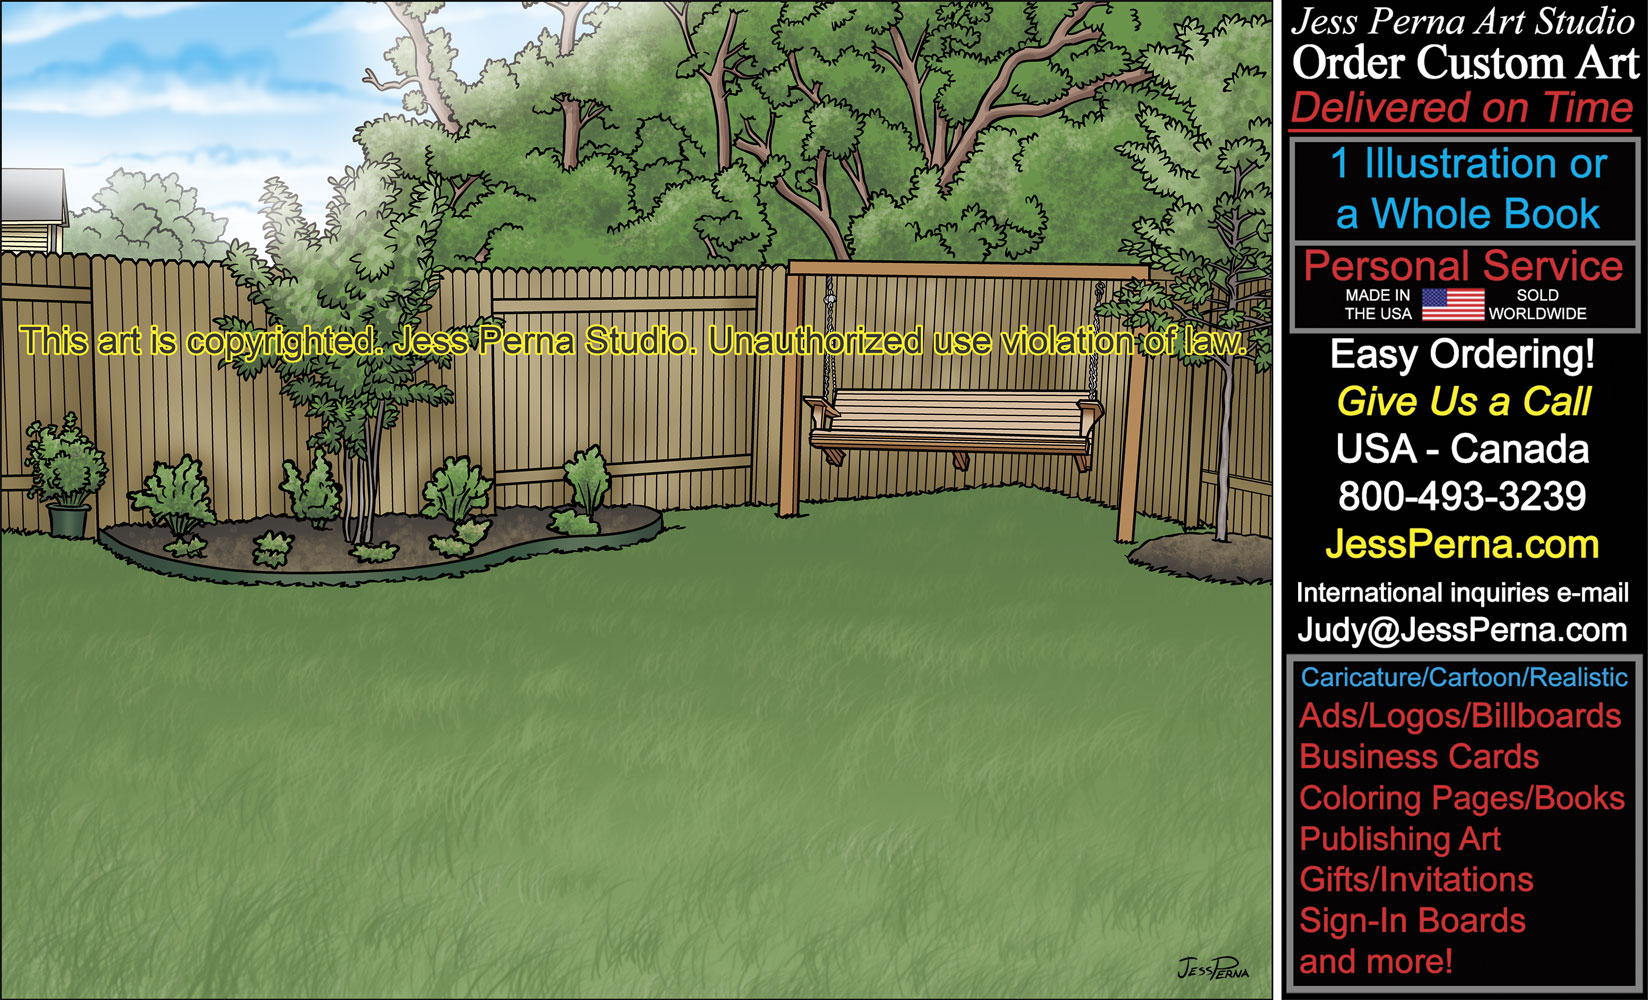 Landscape Illustration Vector Free: Order Landscape Advertising Artwork And Gifts Drawings